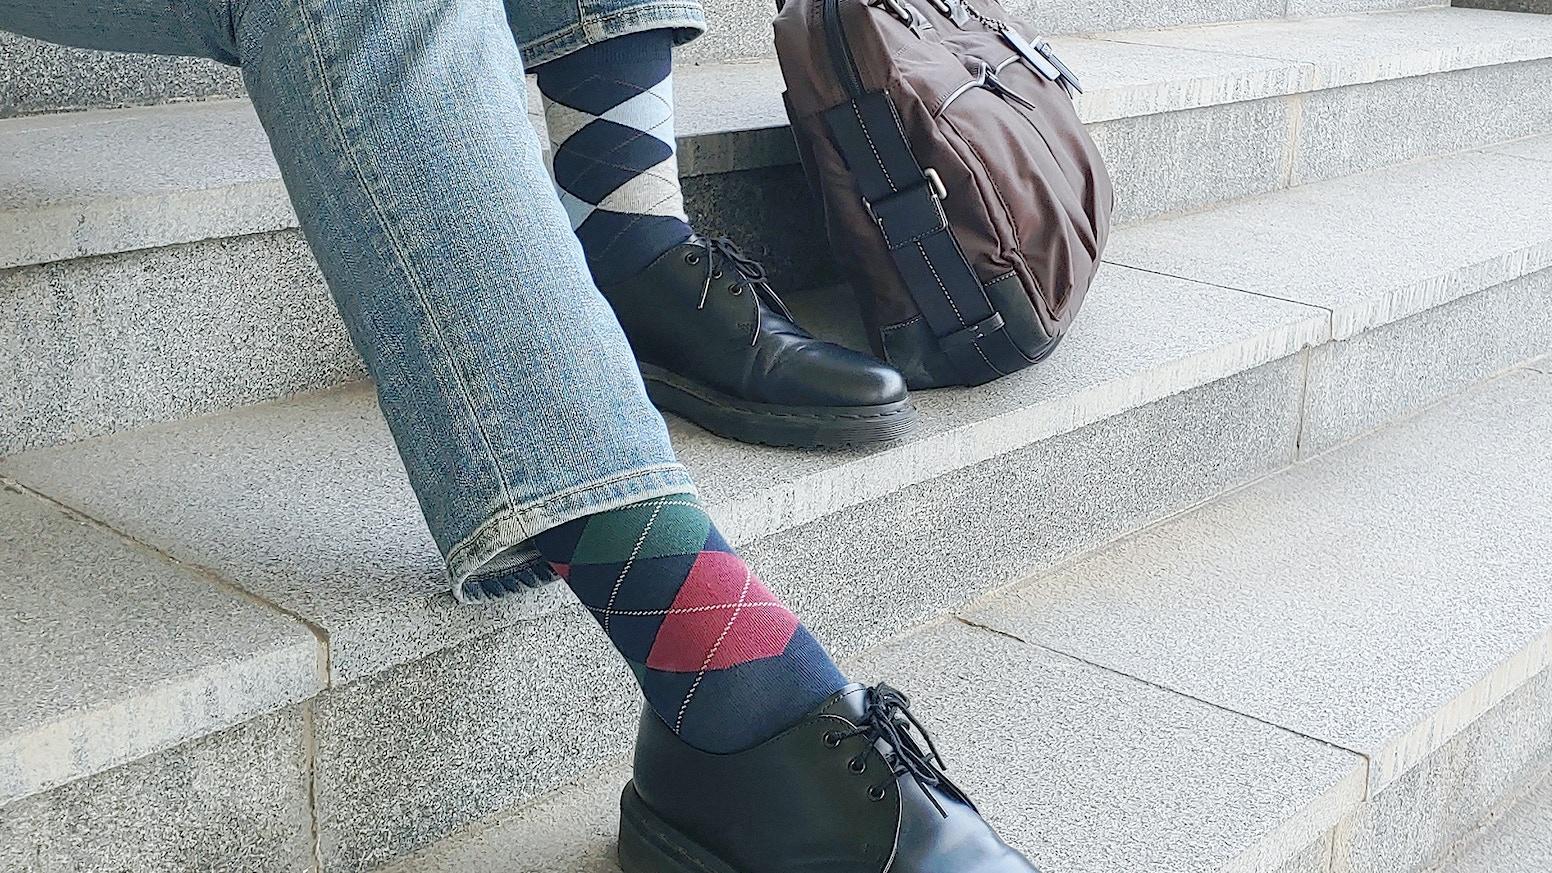 World's most versatile socks for men - Features heat regulation, odor elimination & bacteria suppression.